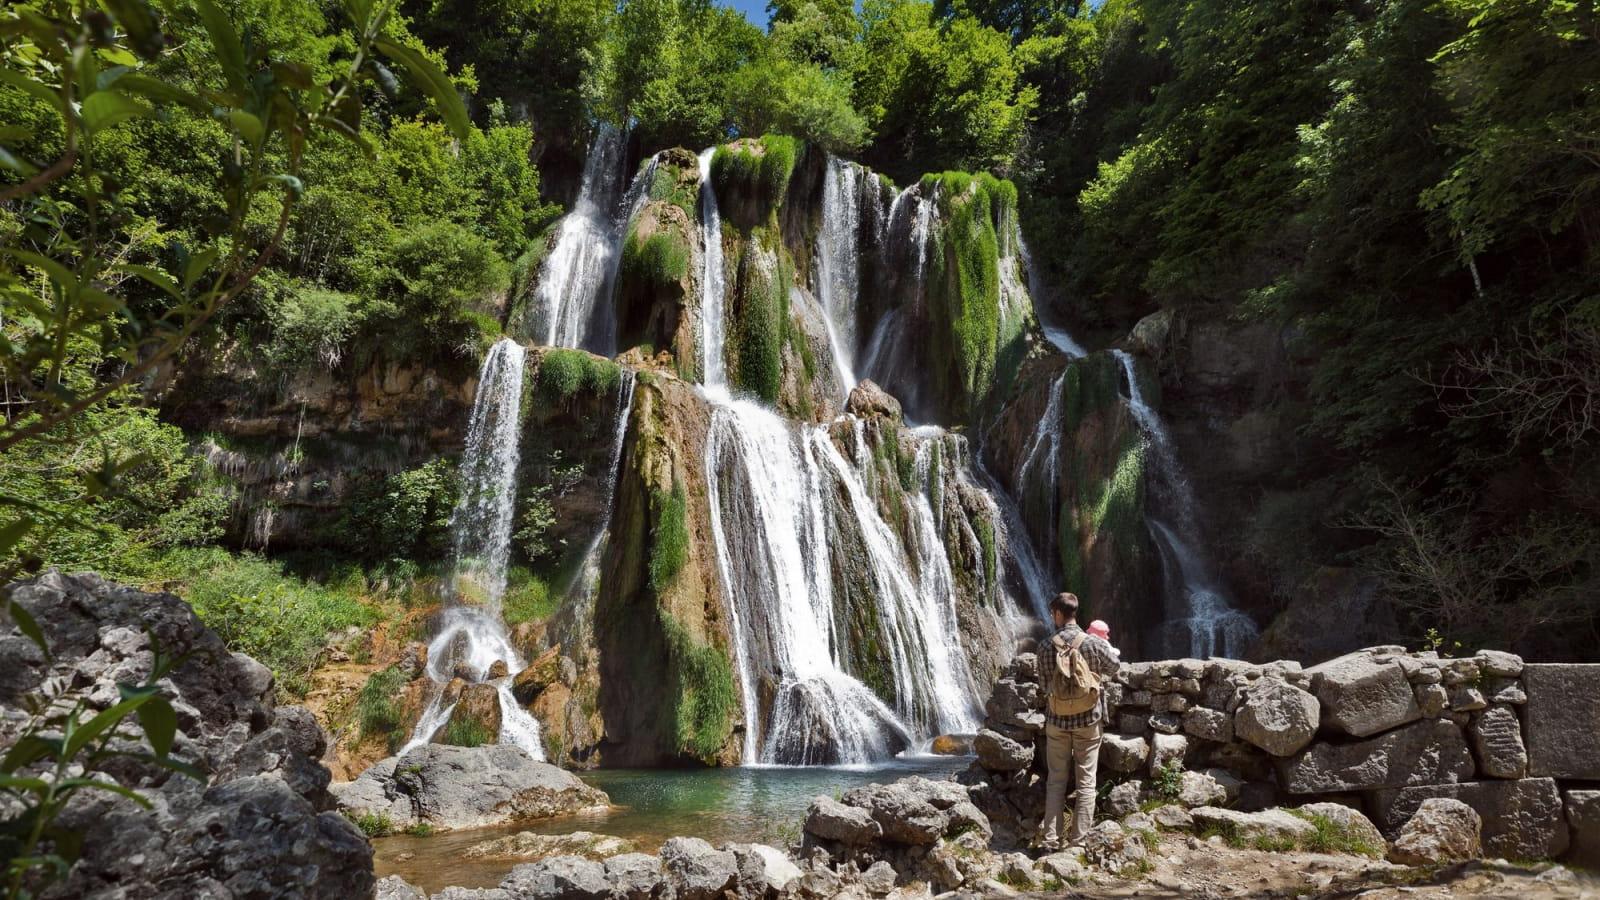 Cascade de Glandieu, visite en famille